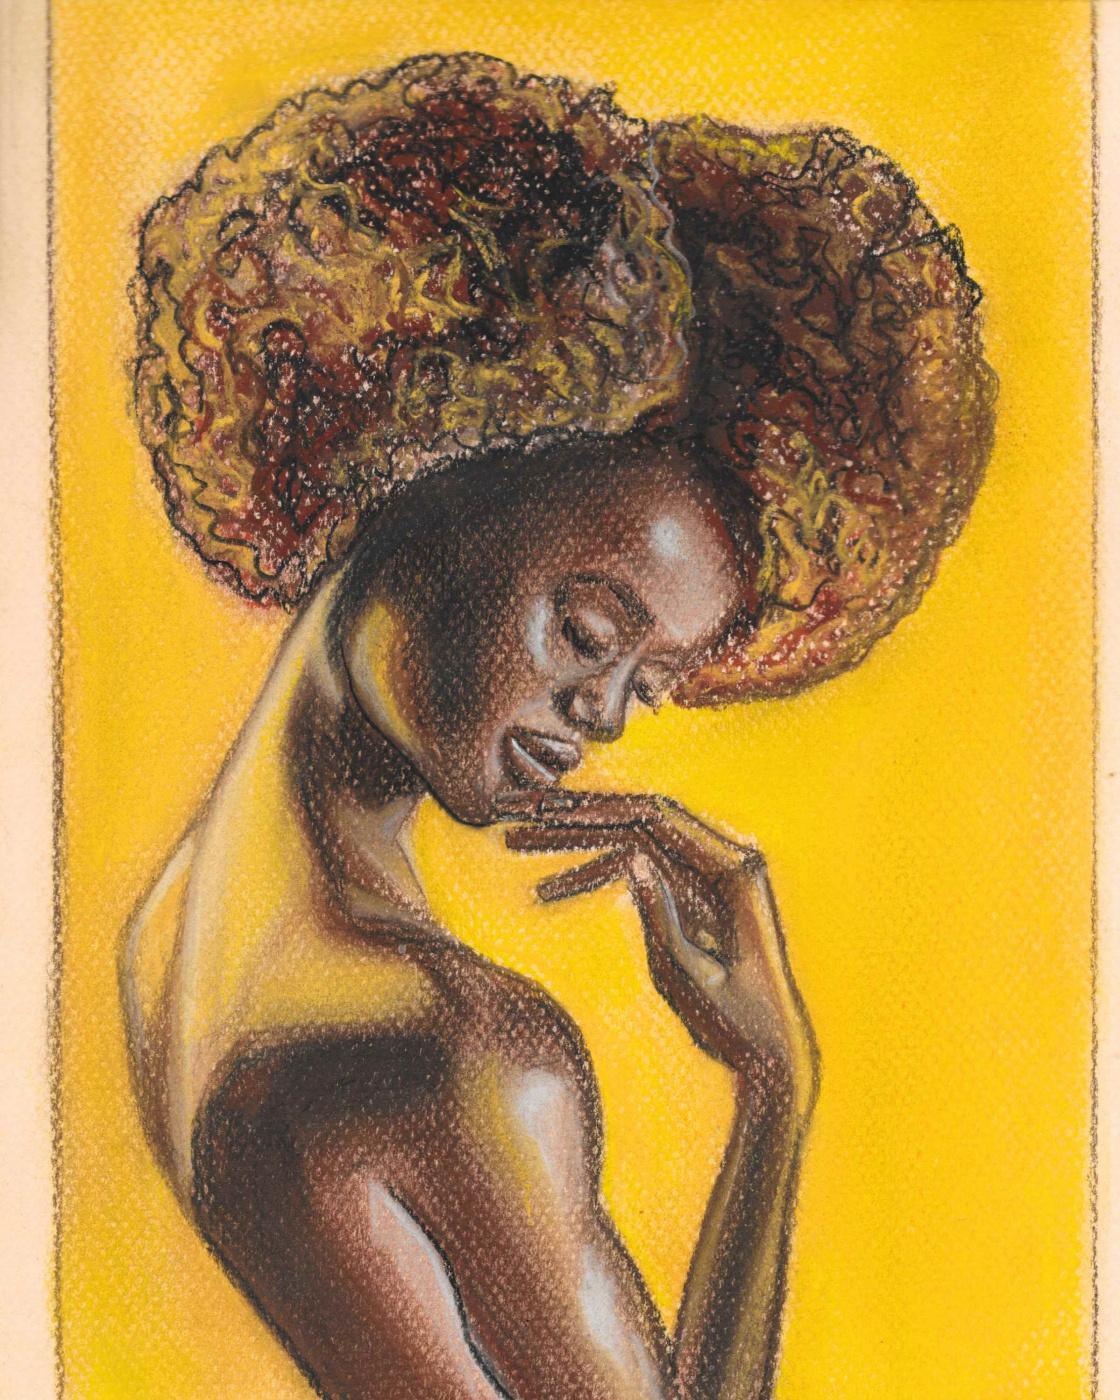 Marina Tumilovich. Woman portrait on yellow background